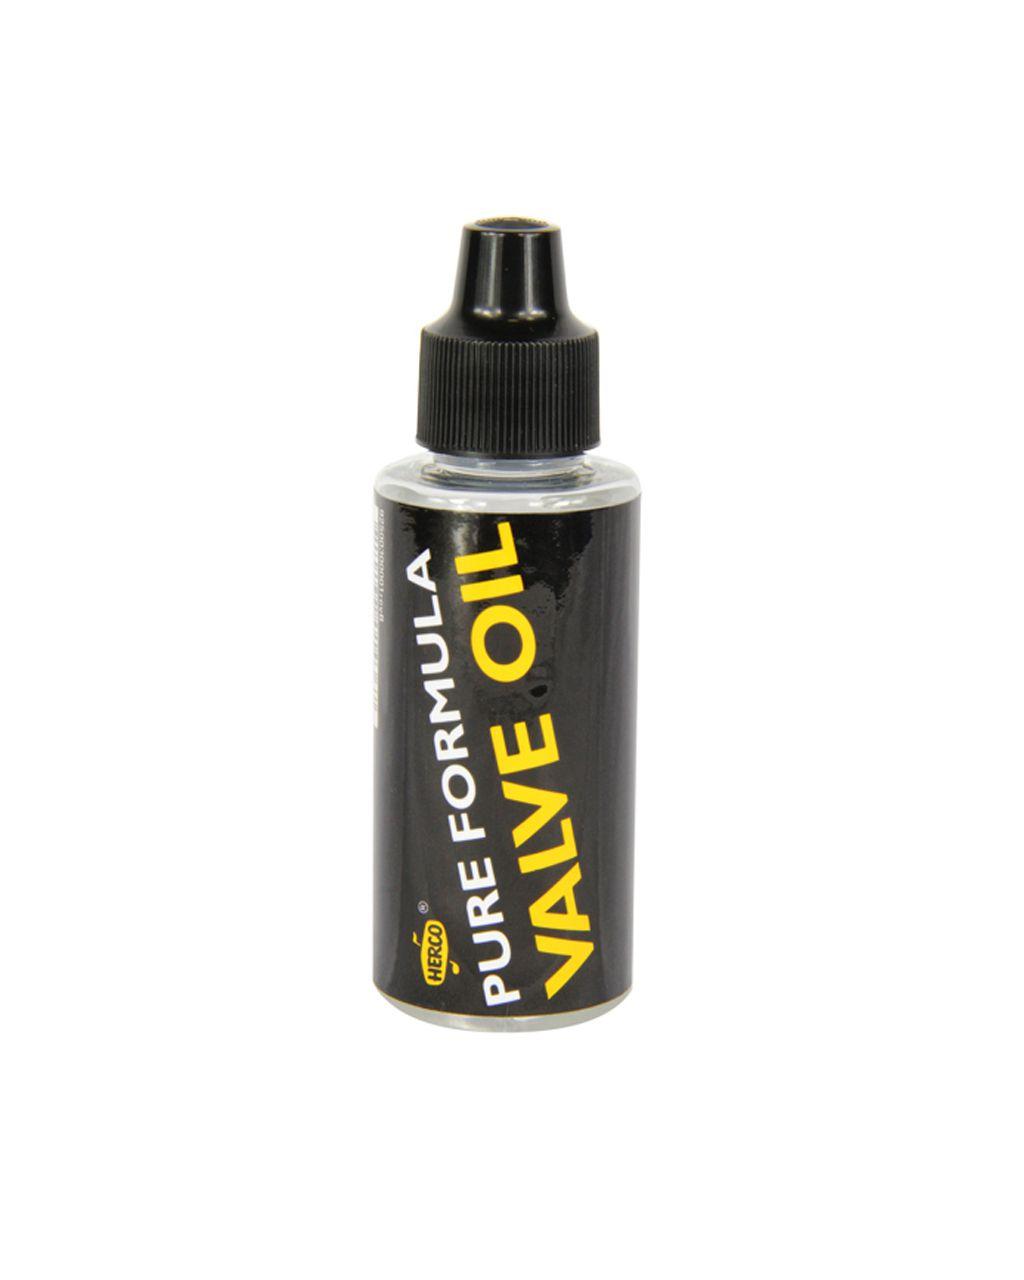 Óleo Lubrificante Dunlop Herco Valve Oil para Pisto